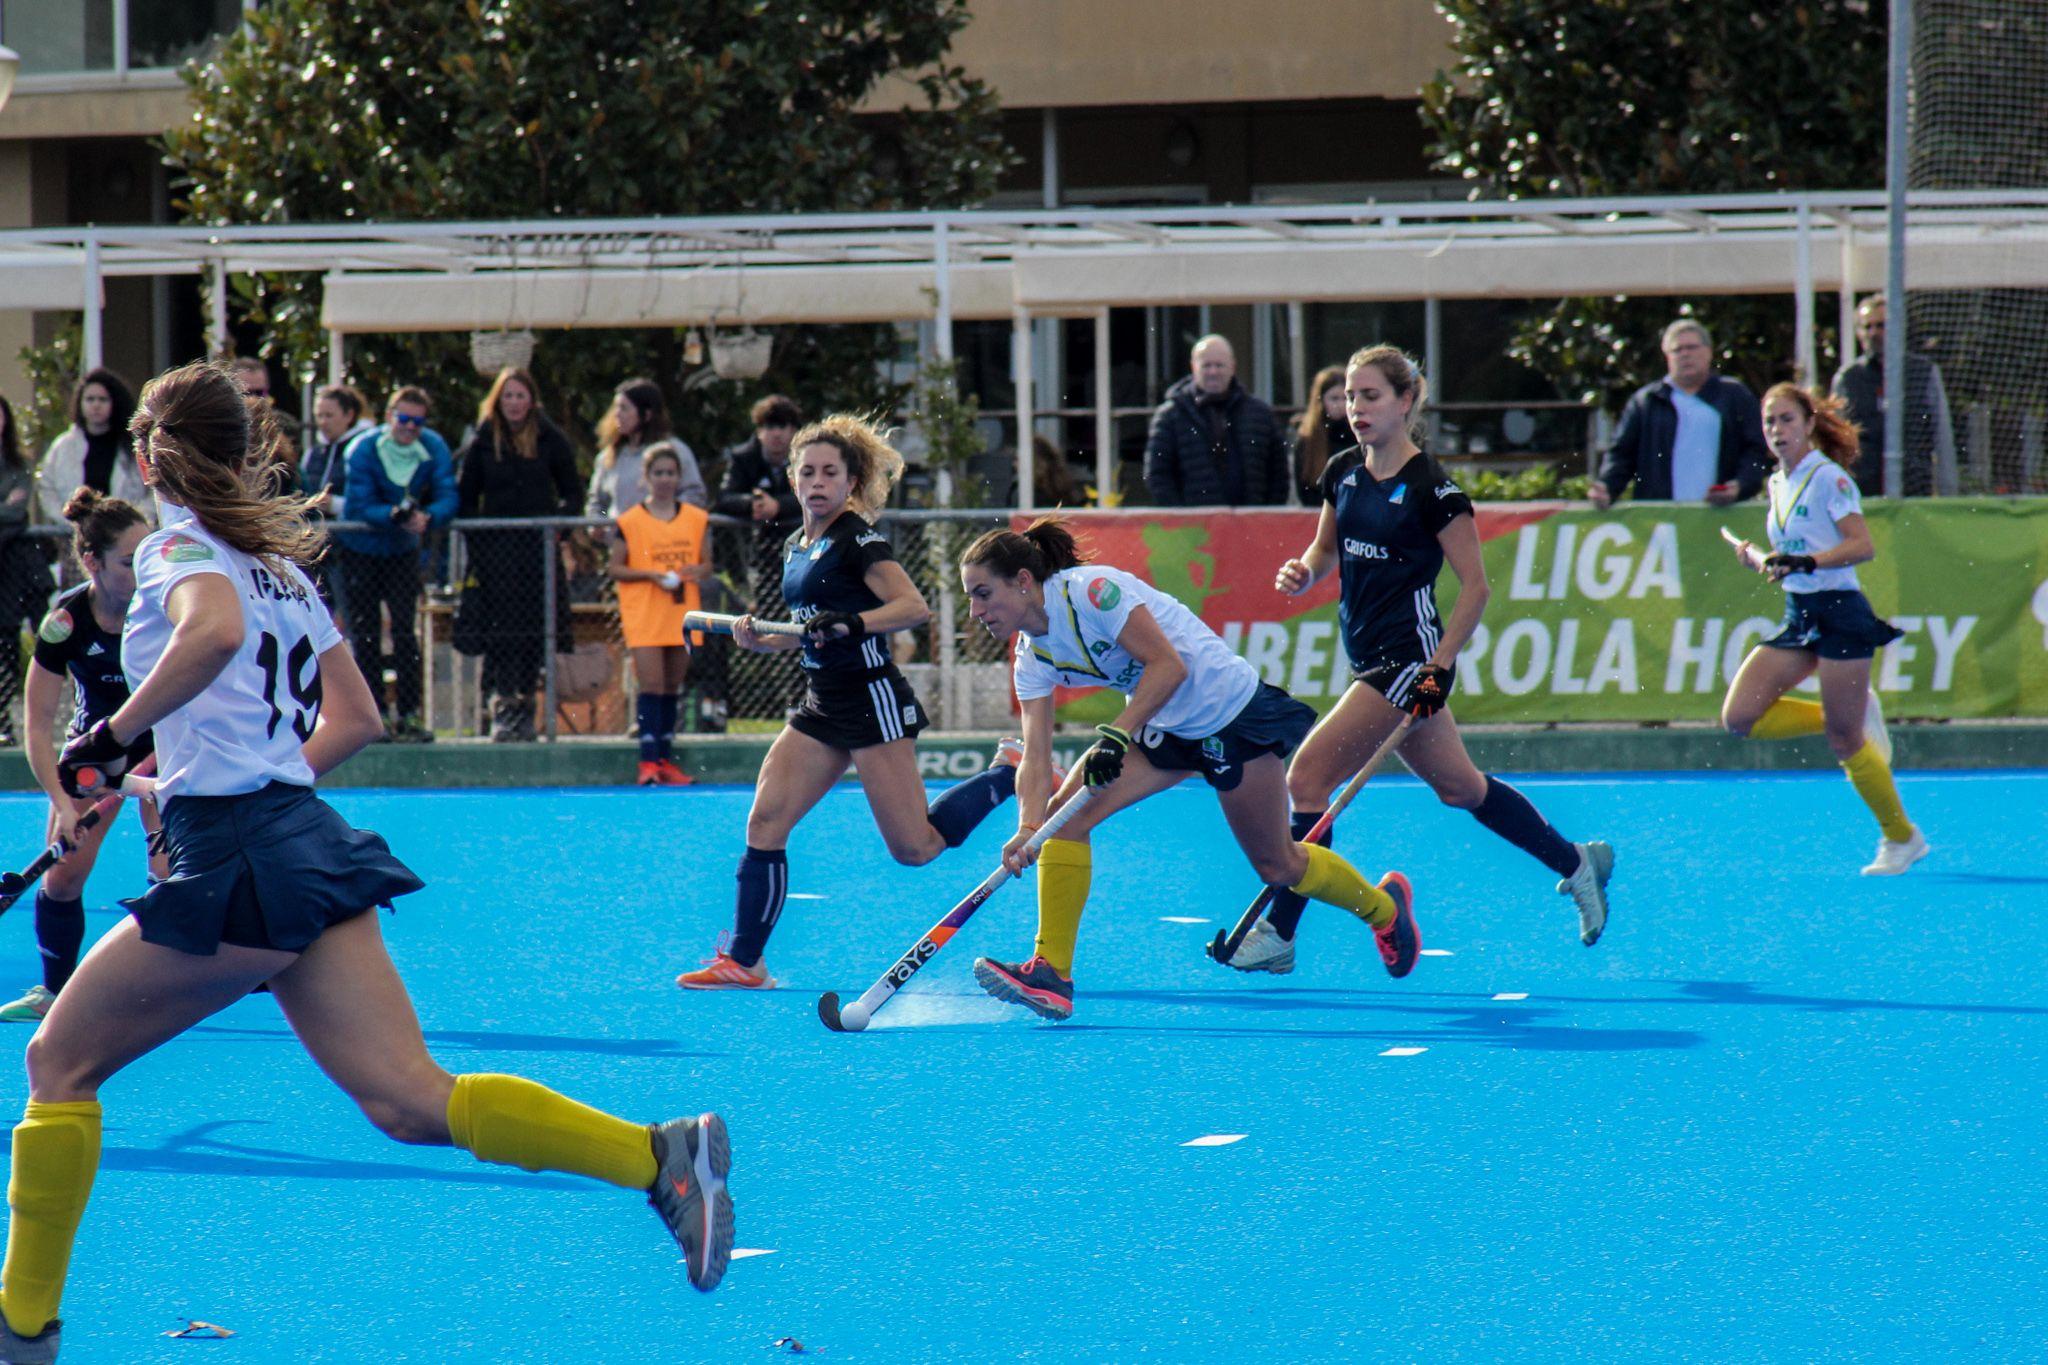 Lliga de hoquei sobre herba femení: Junior FC-Club de Campo. FOTO: Ale Gómez